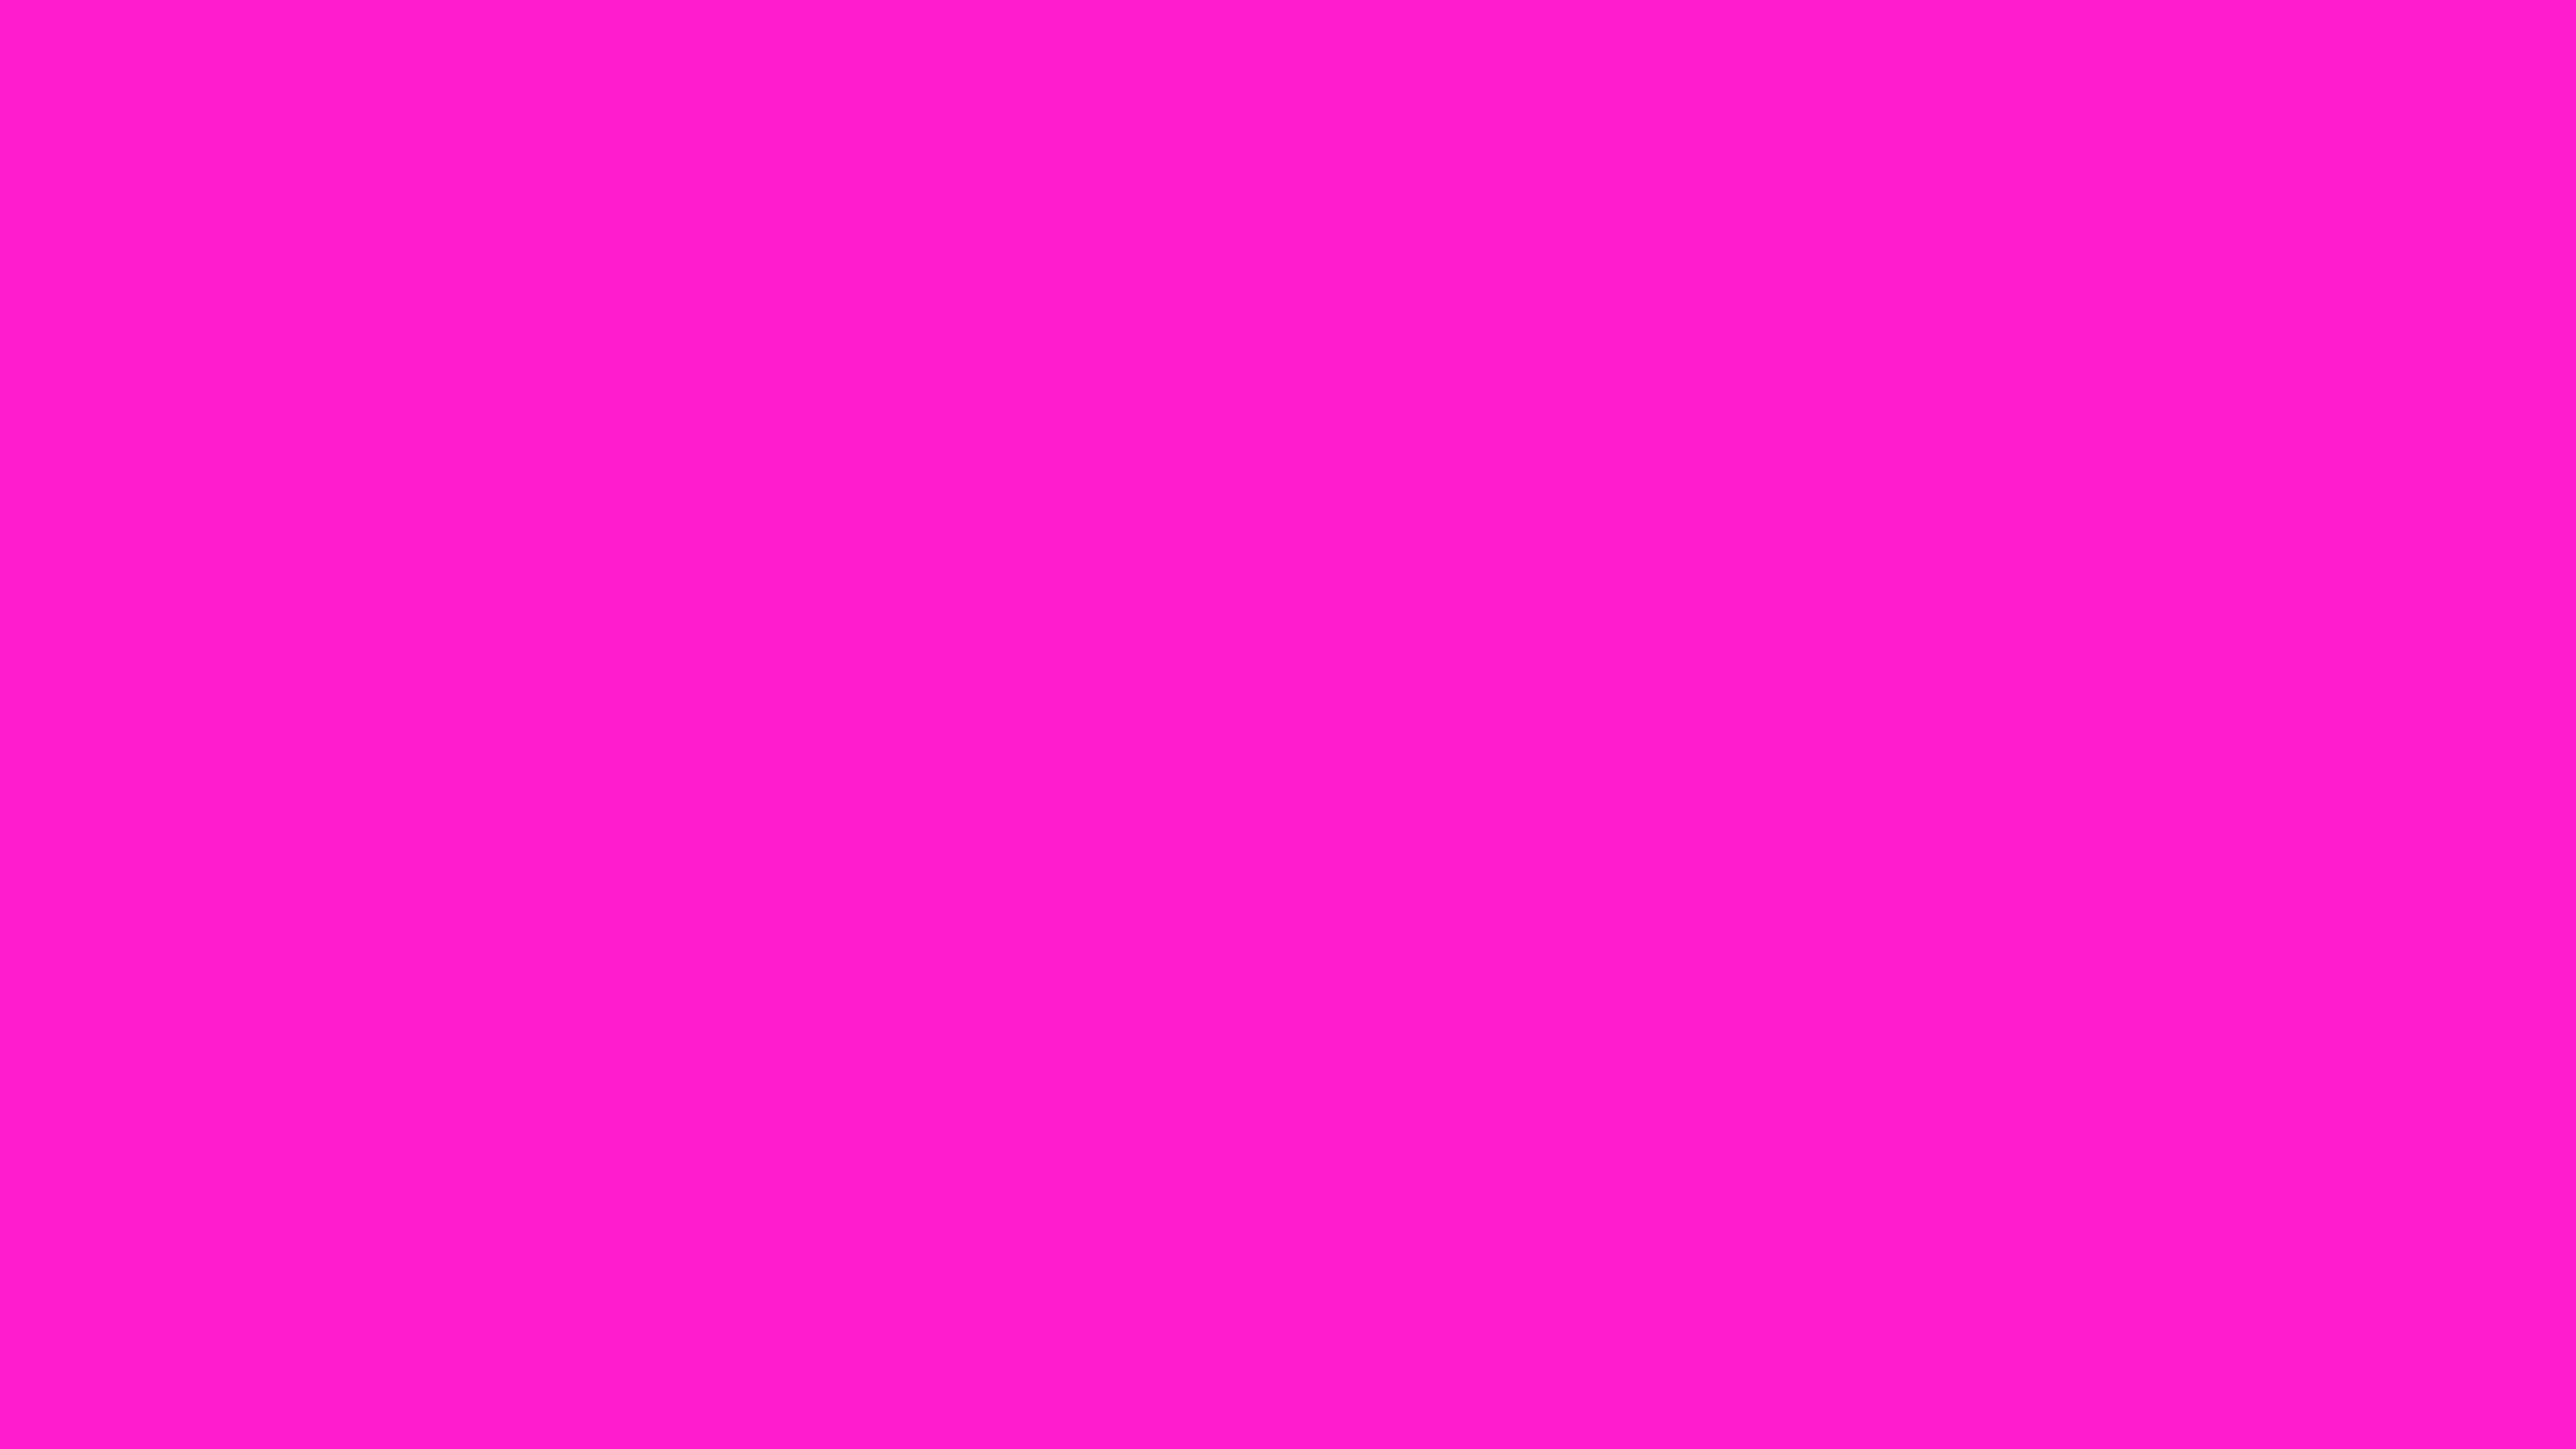 5120x2880 Hot Magenta Solid Color Background